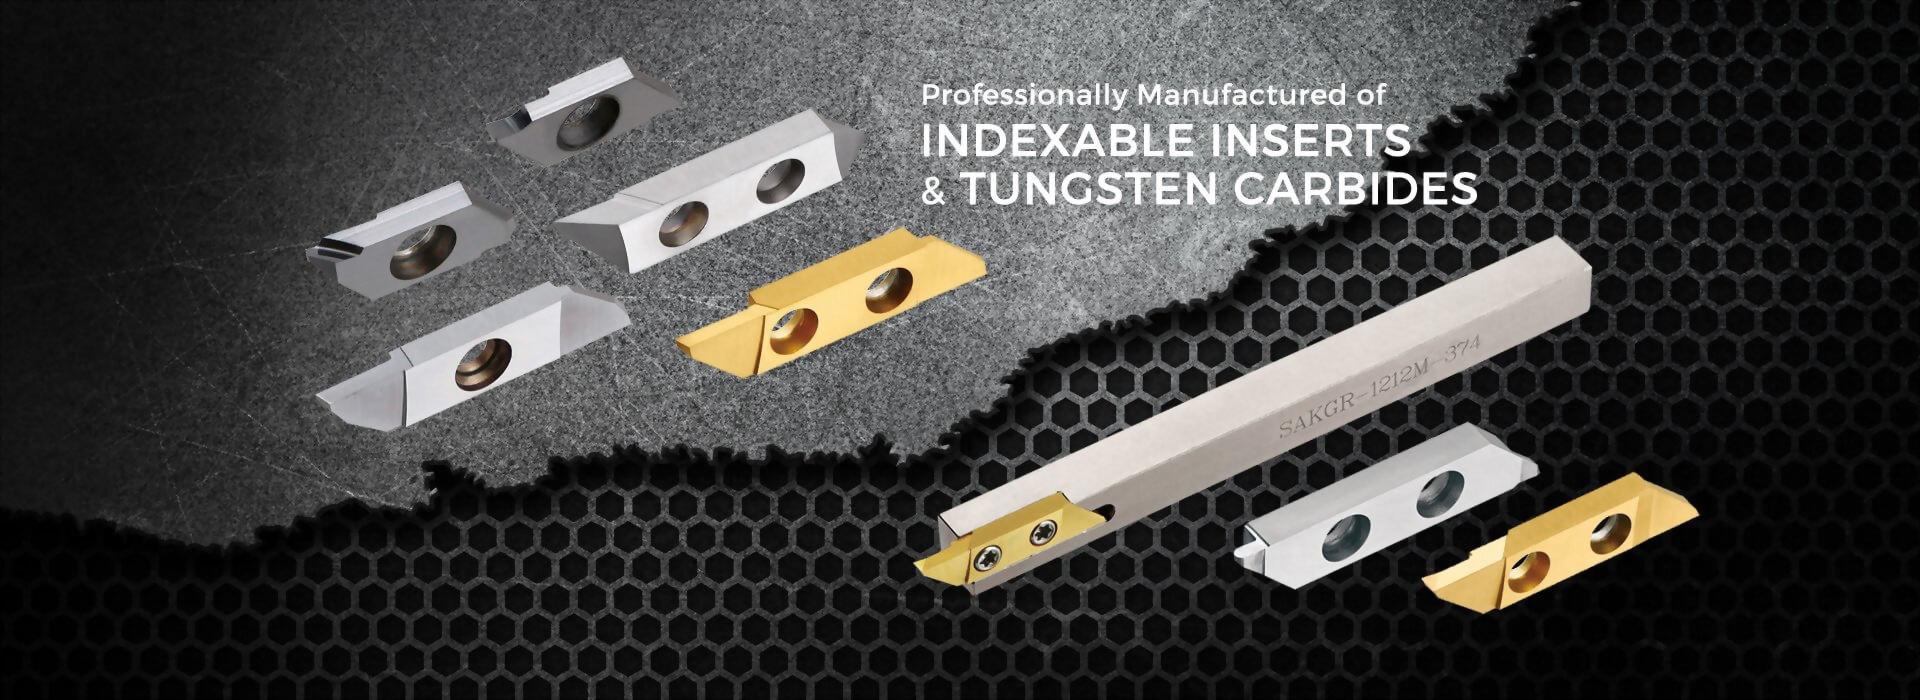 Carbide inserts manufacturers